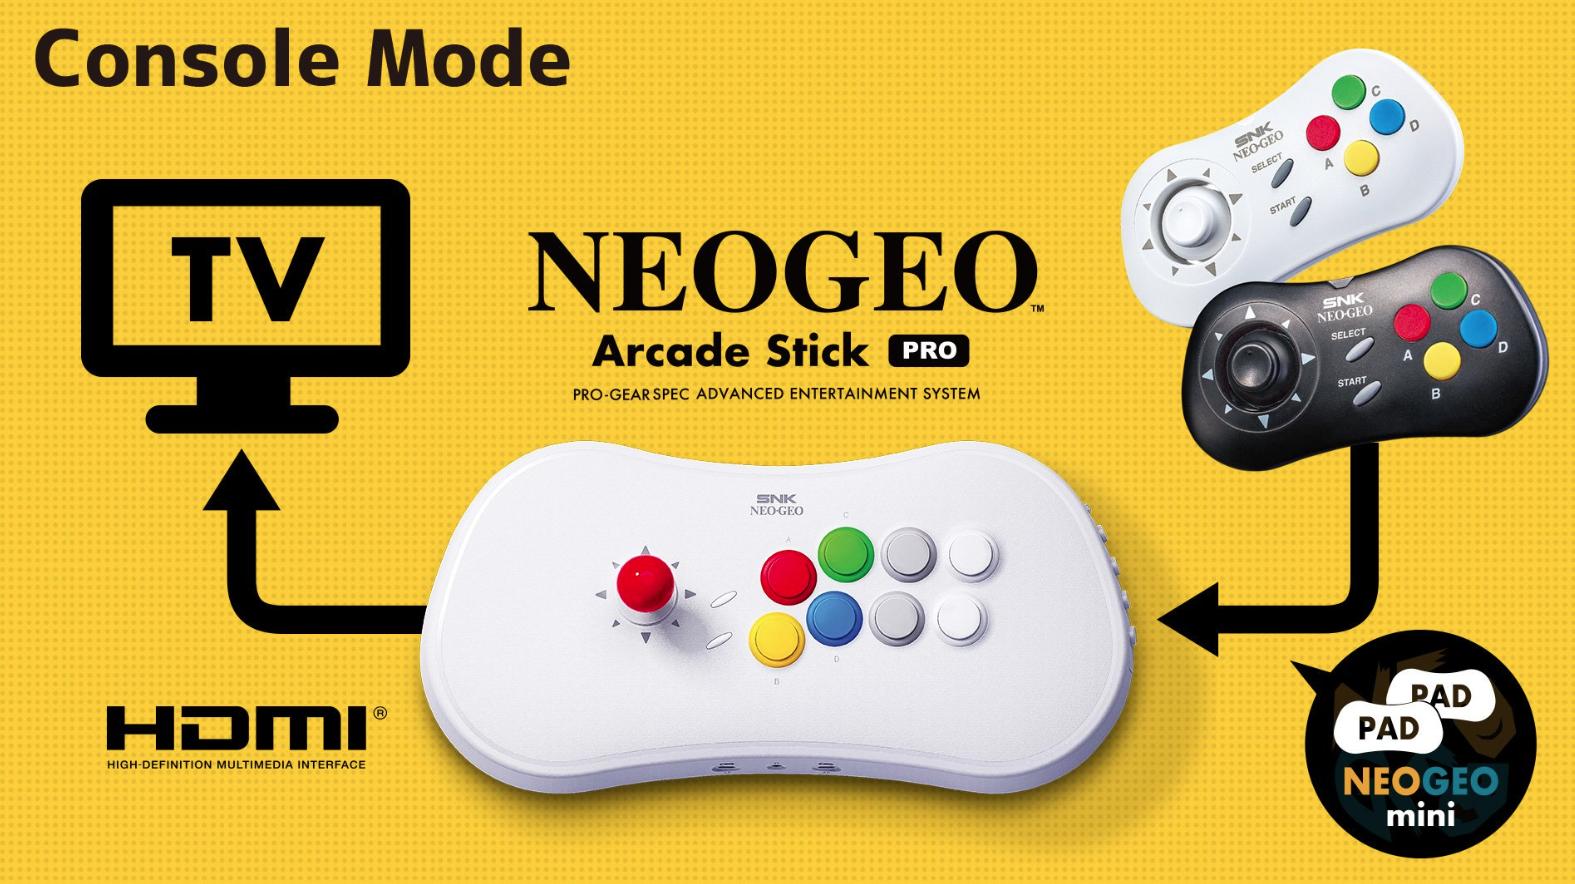 NEOGEO Arcade Stick Pro unveiled